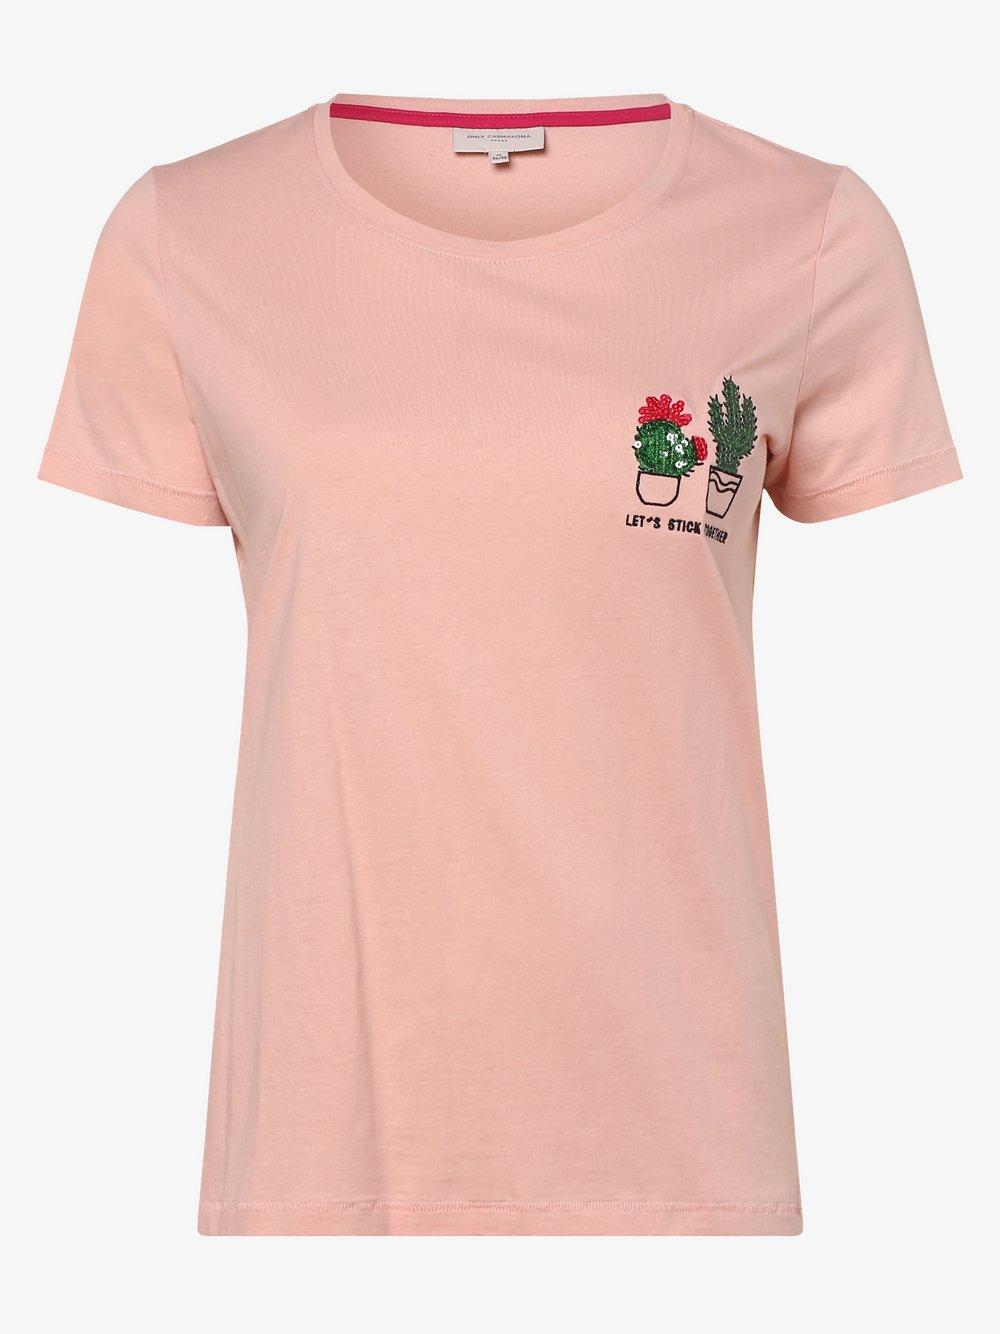 ONLY Carmakoma – T-shirt damski – Carchase Life, różowy Van Graaf 476892-0001